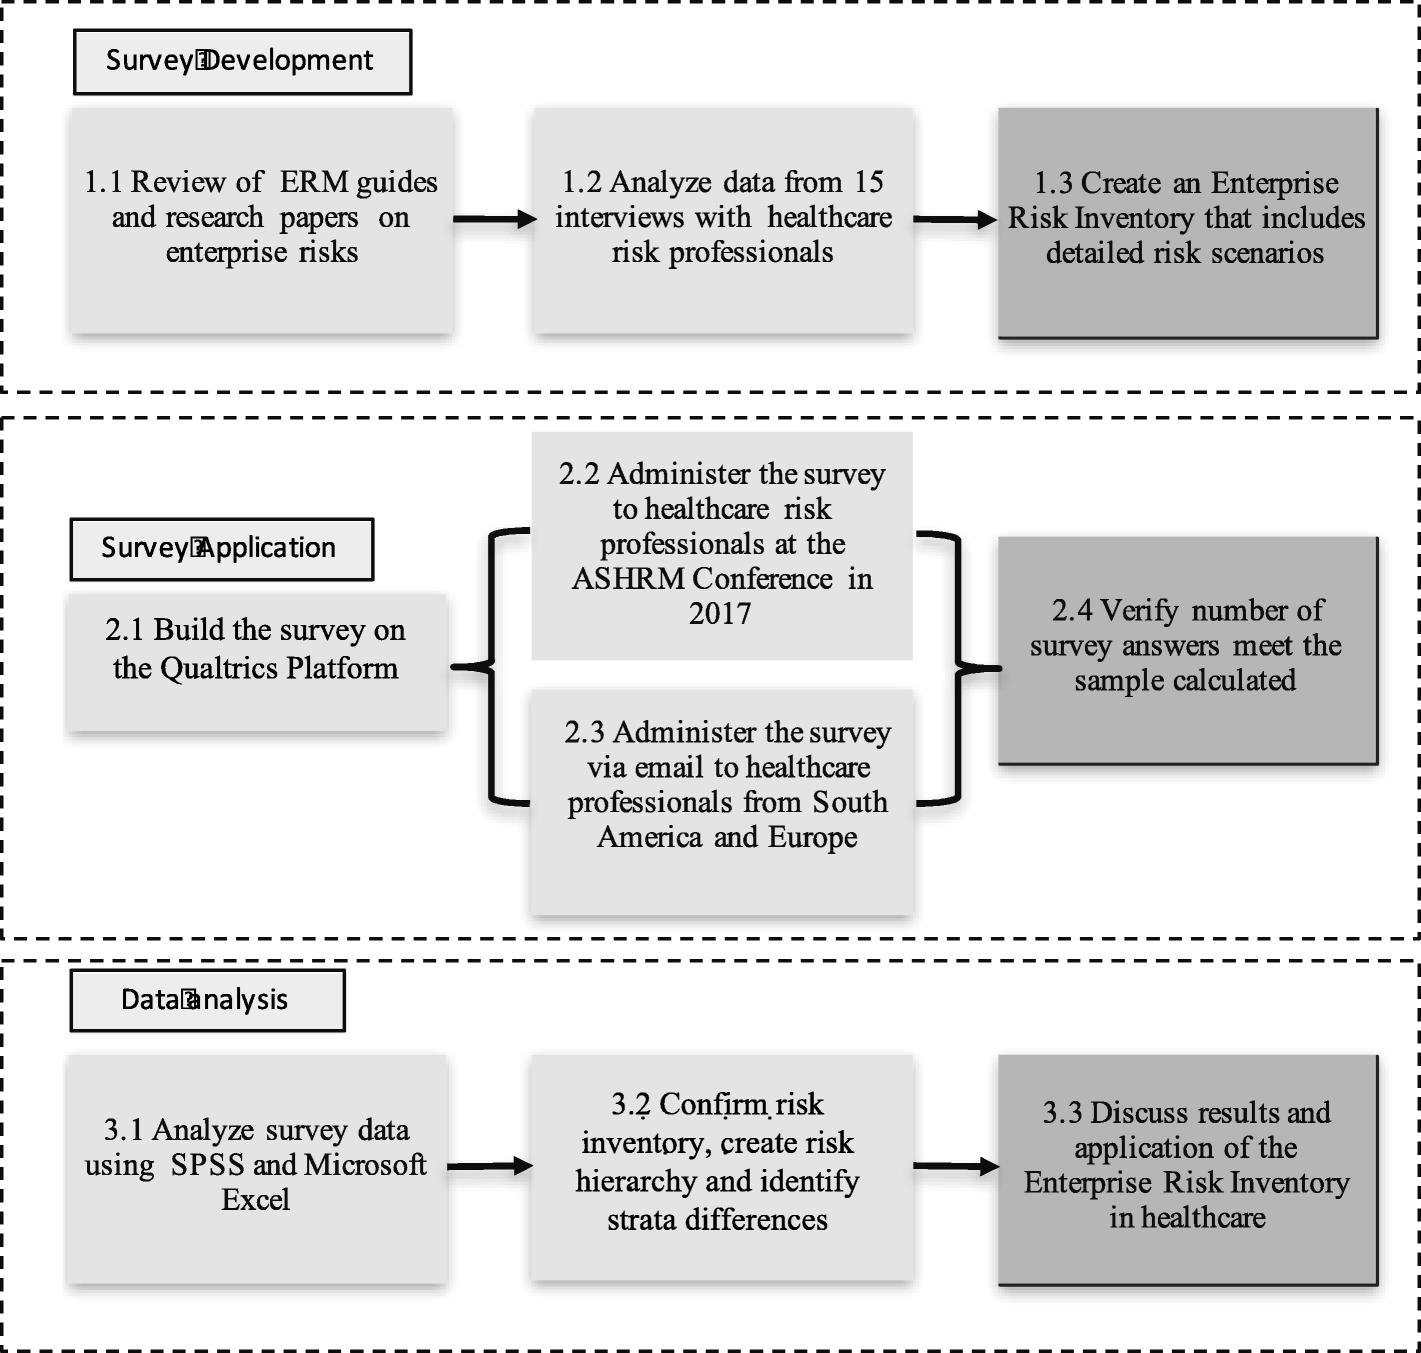 Development of an enterprise risk inventory for healthcare